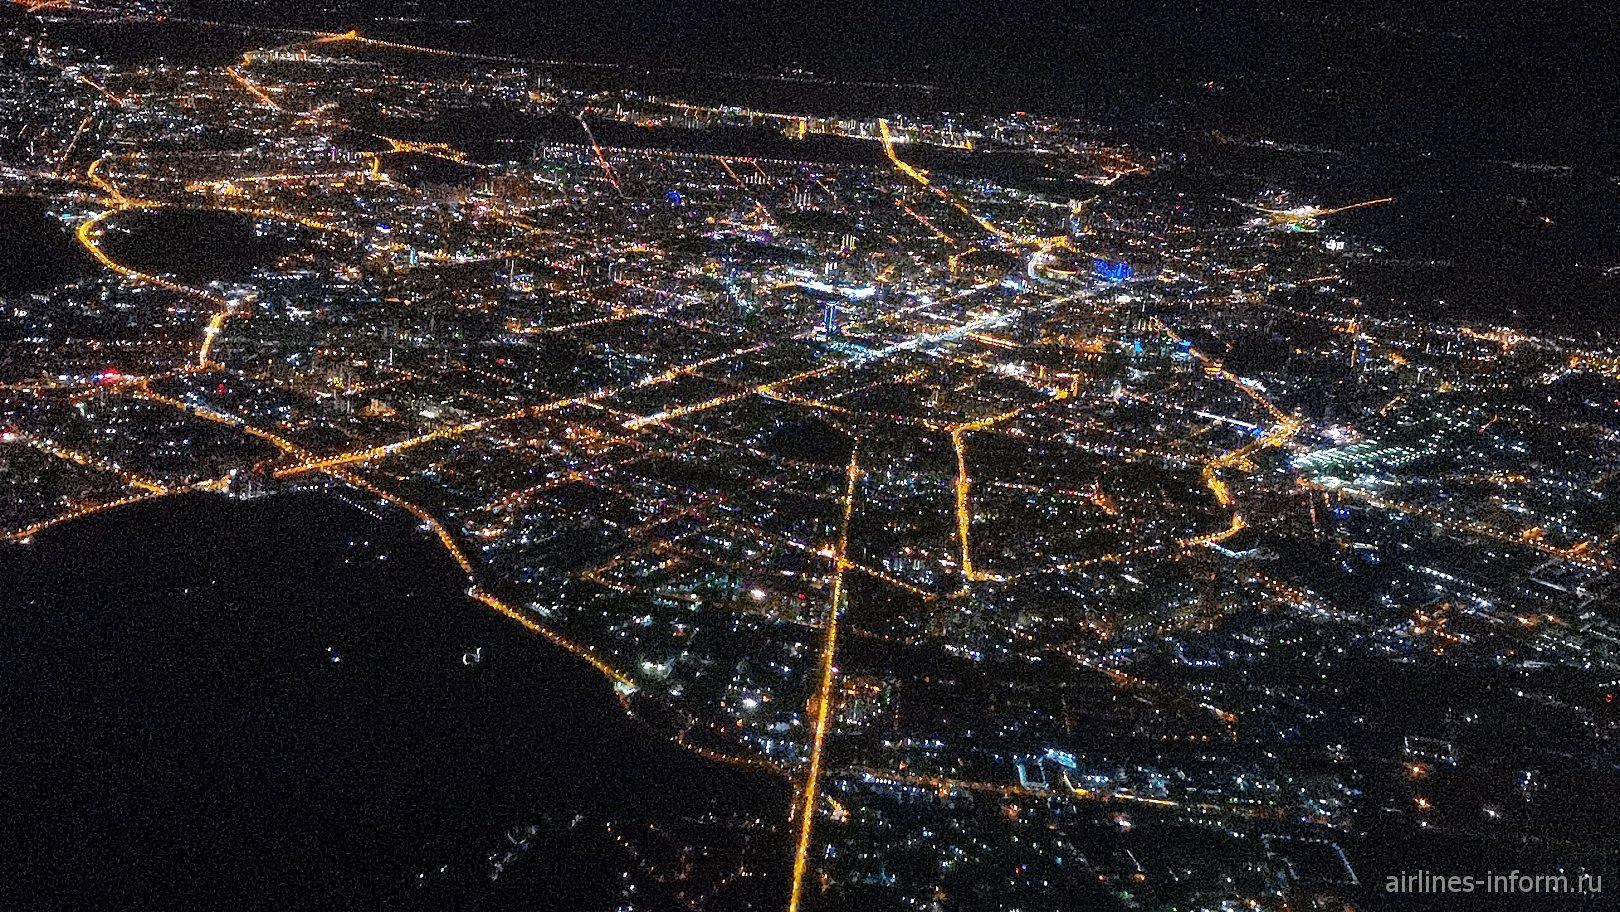 Вид на ночной Екатеринбург перед посадкой в аэропорту Кольцово